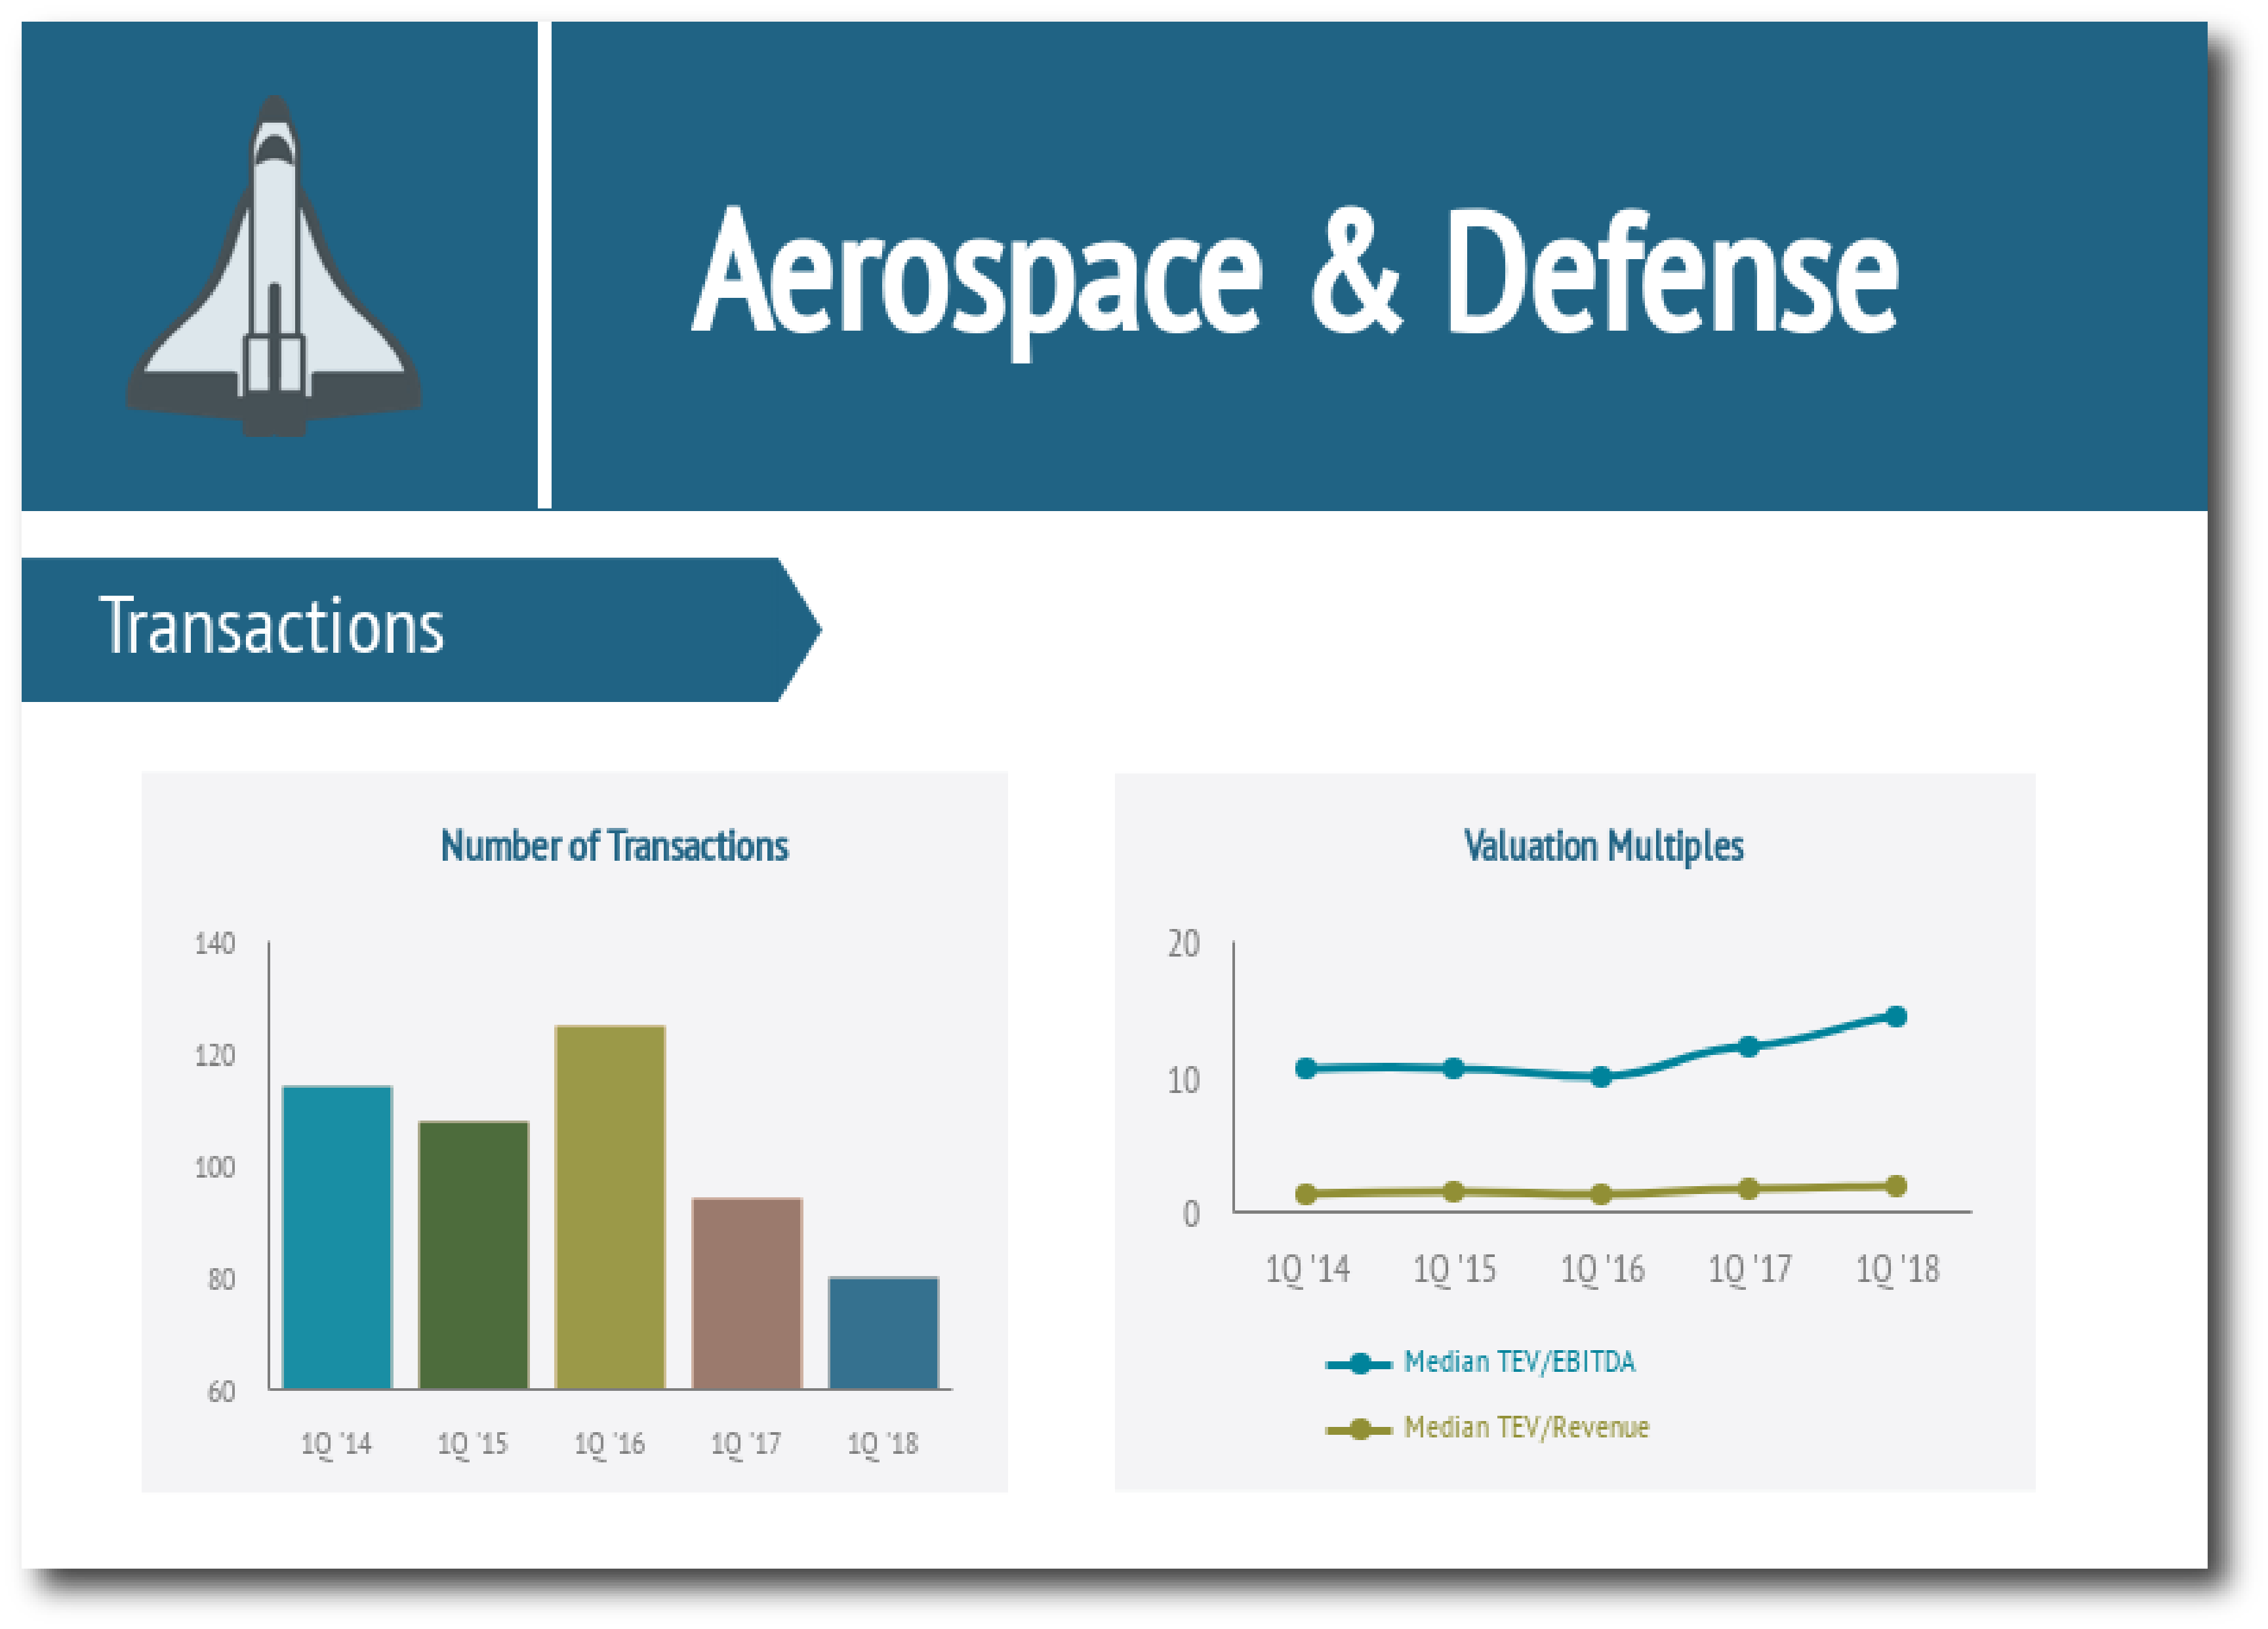 Aerospace & Defense Industry Report